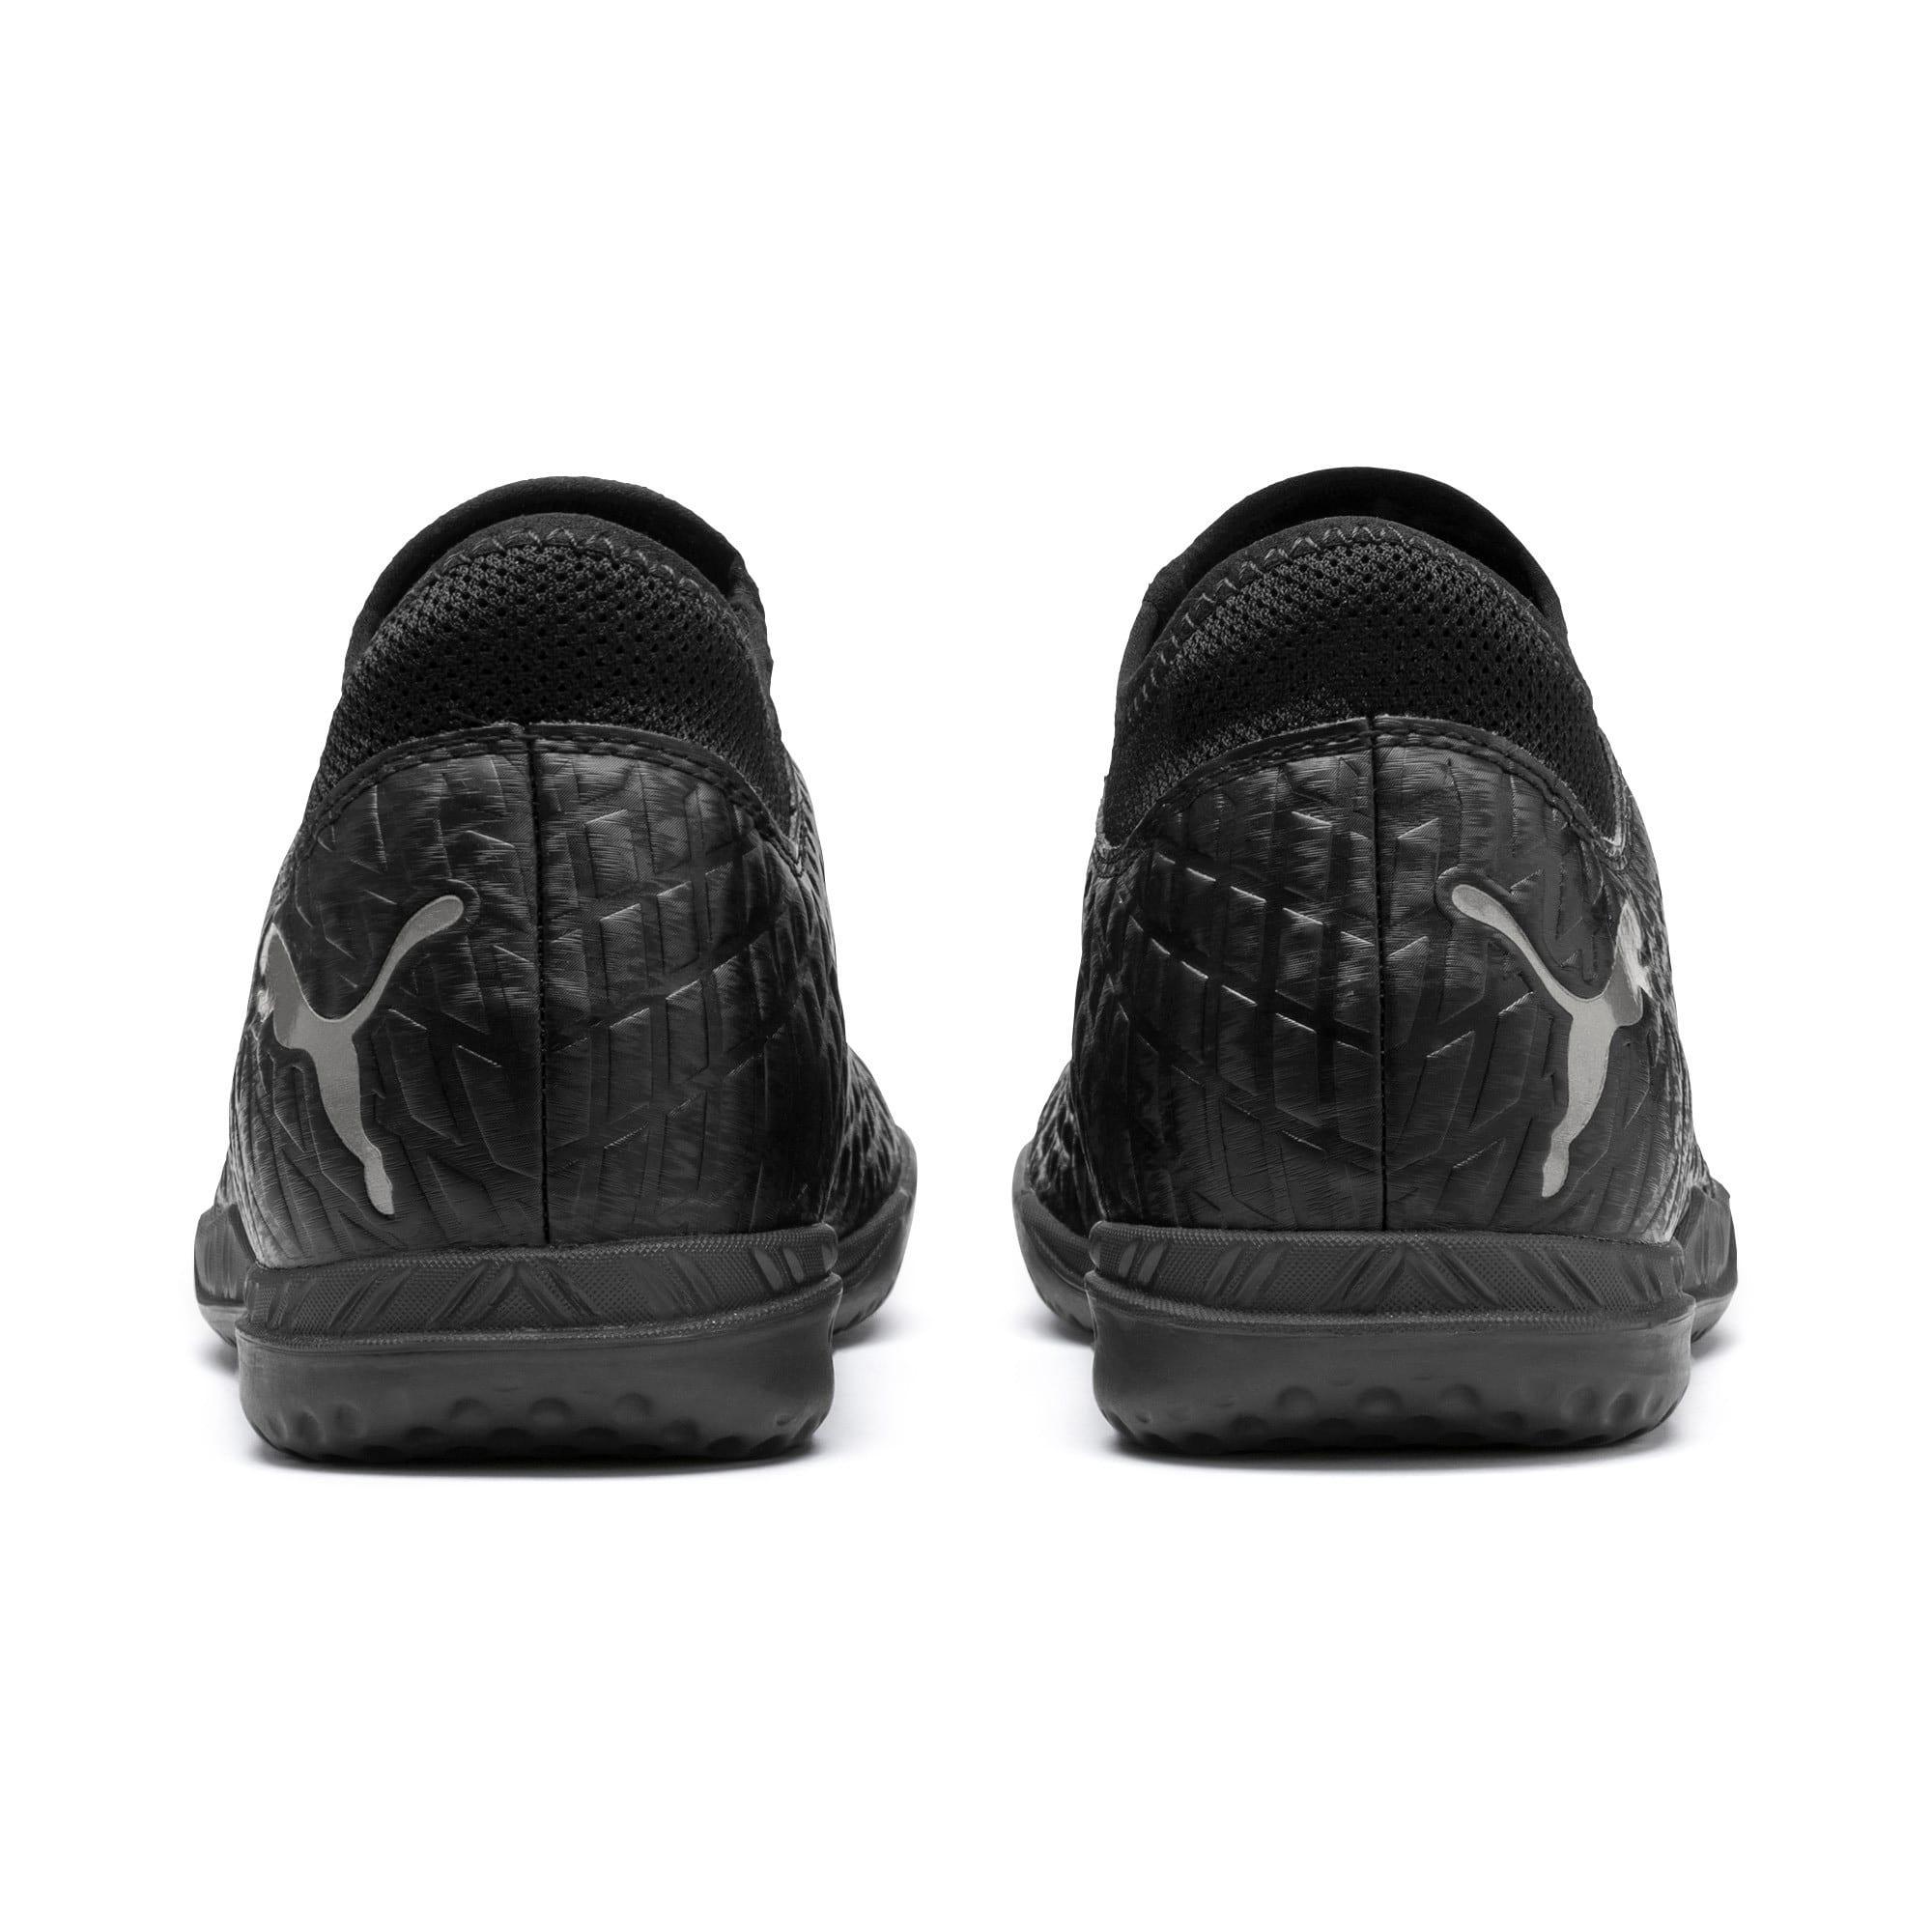 Thumbnail 4 of FUTURE 4.4 TT Men's Soccer Shoes, Black-Black-Puma Aged Silver, medium